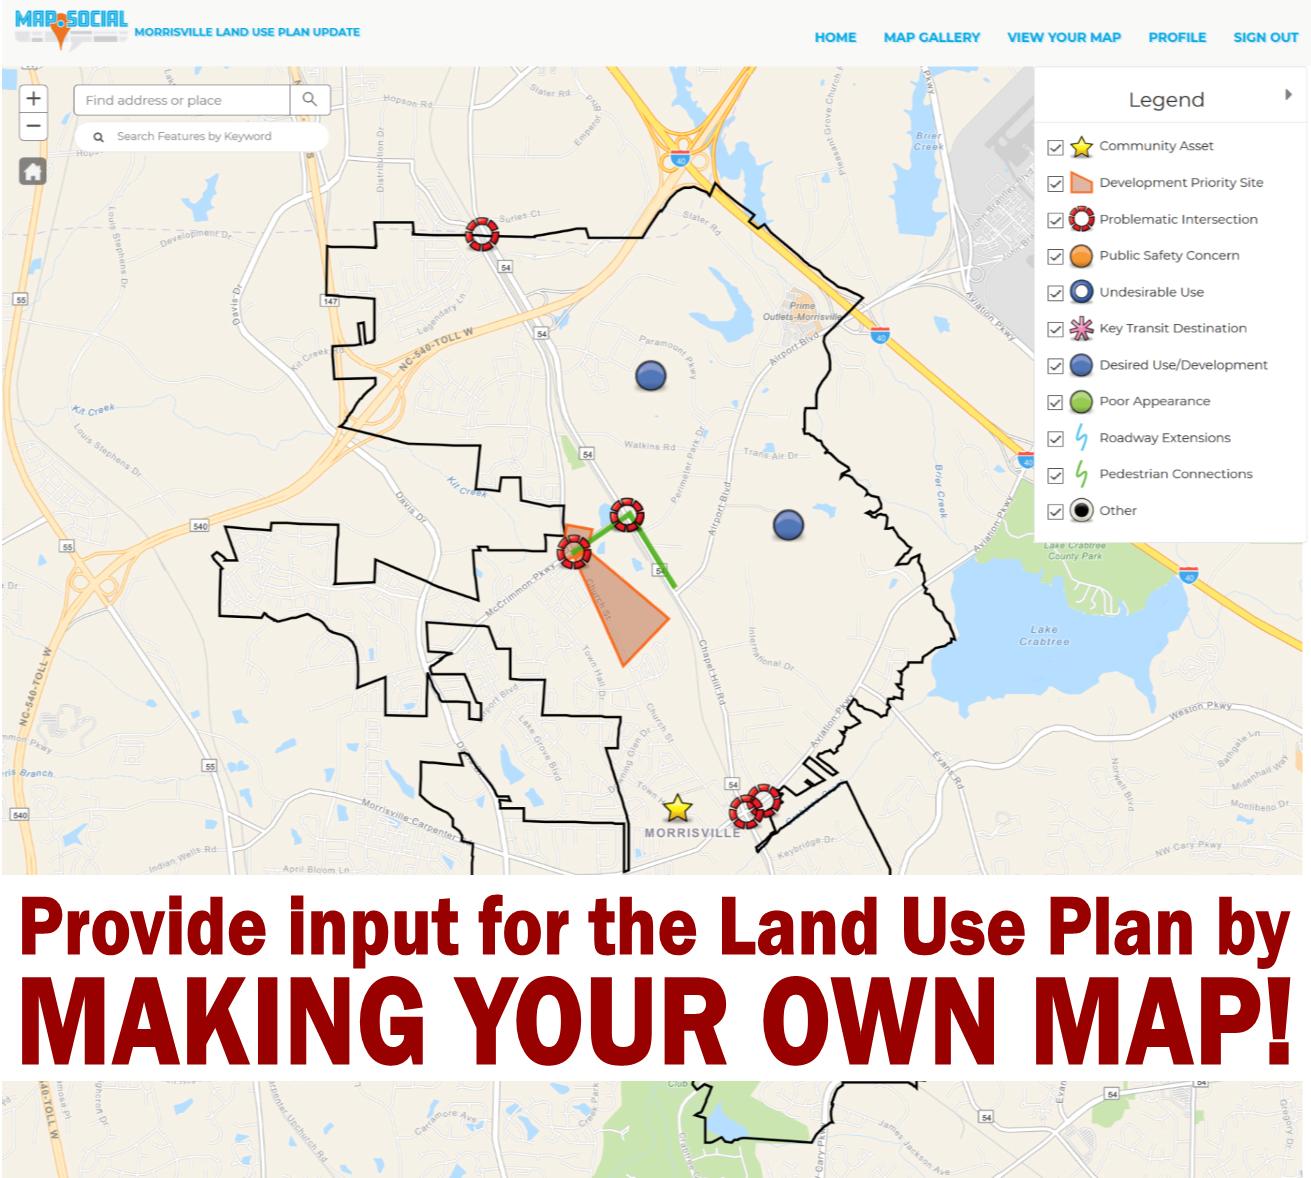 Land Use Plan Make Your Own Map